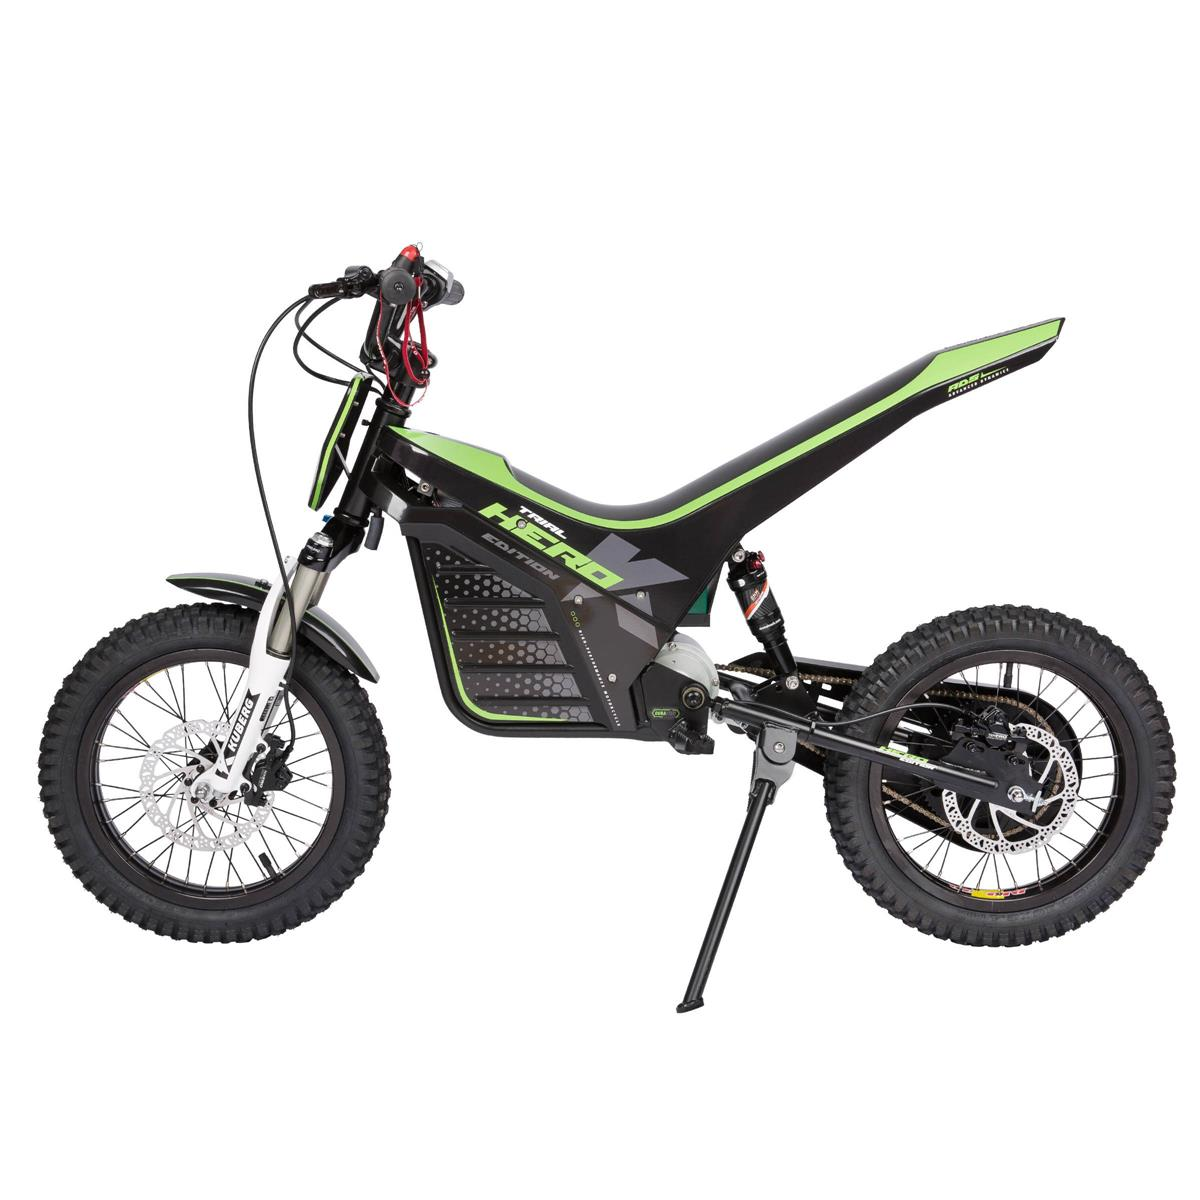 Kuberg Elektromotorrad Young Hero Trial-E, 5 - 12 Jahre